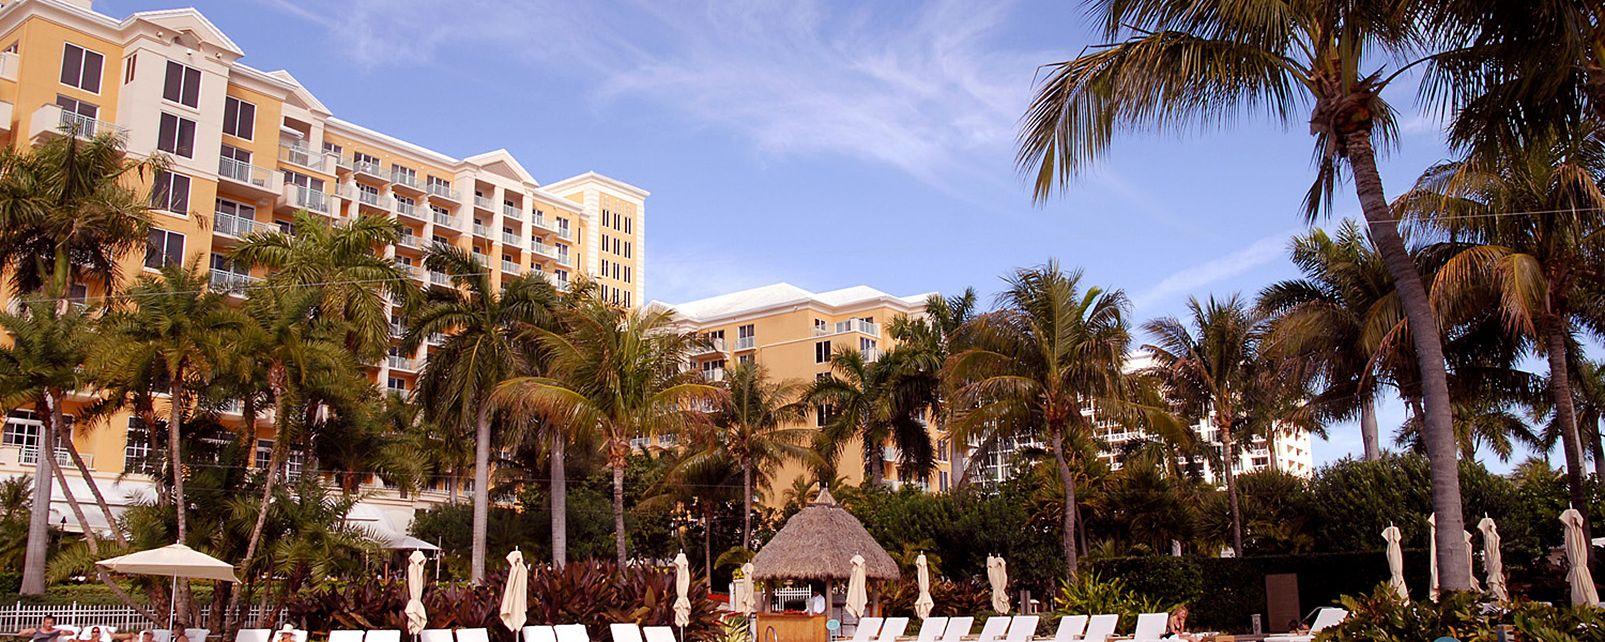 Hotel Ritz-Carlton Key Biscayne